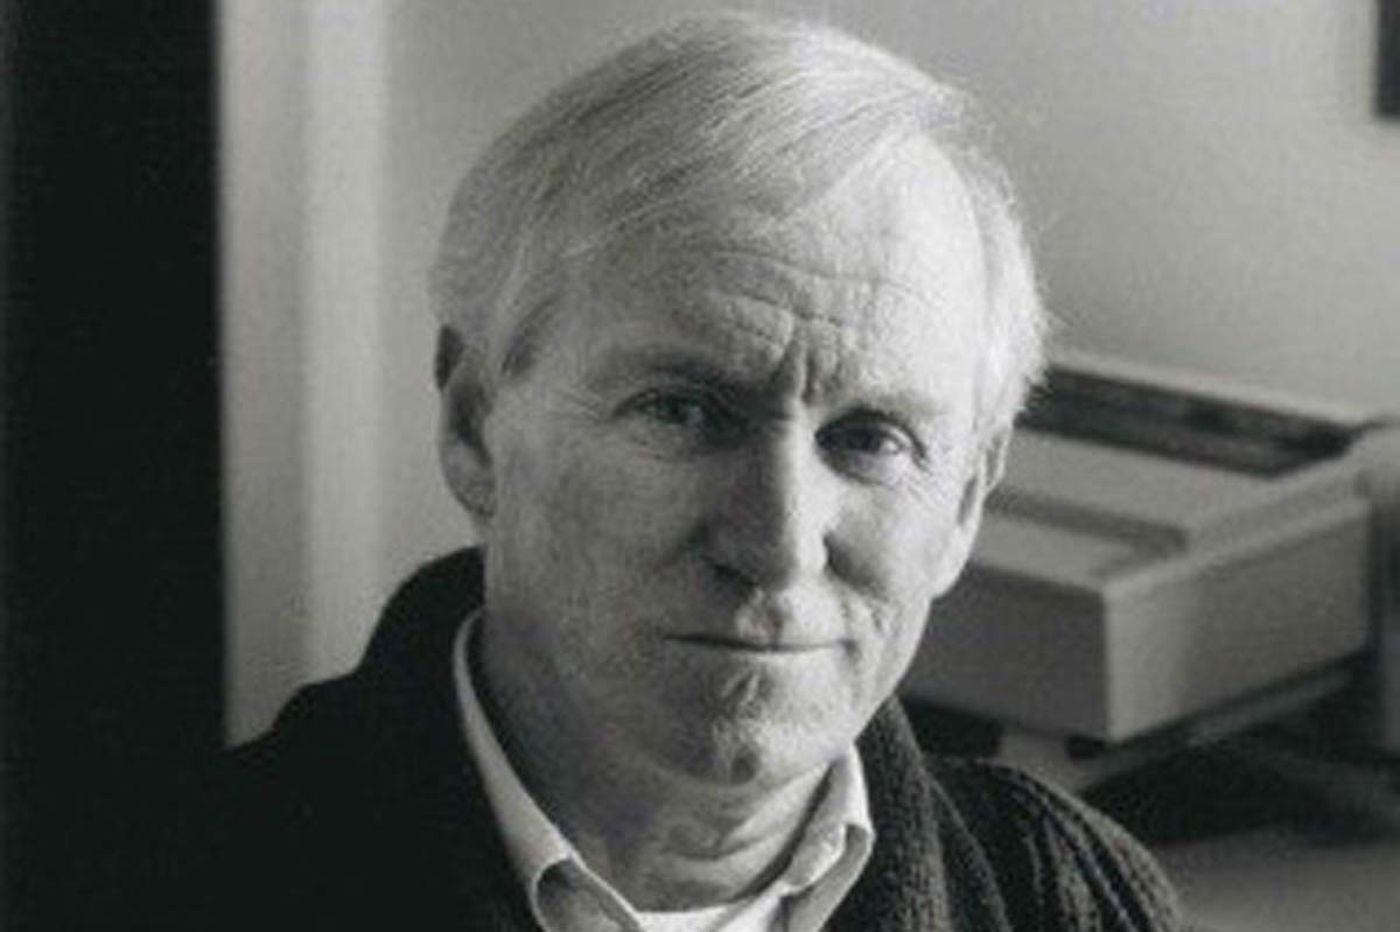 Donald H. Fey, 82, father of Tina Fey